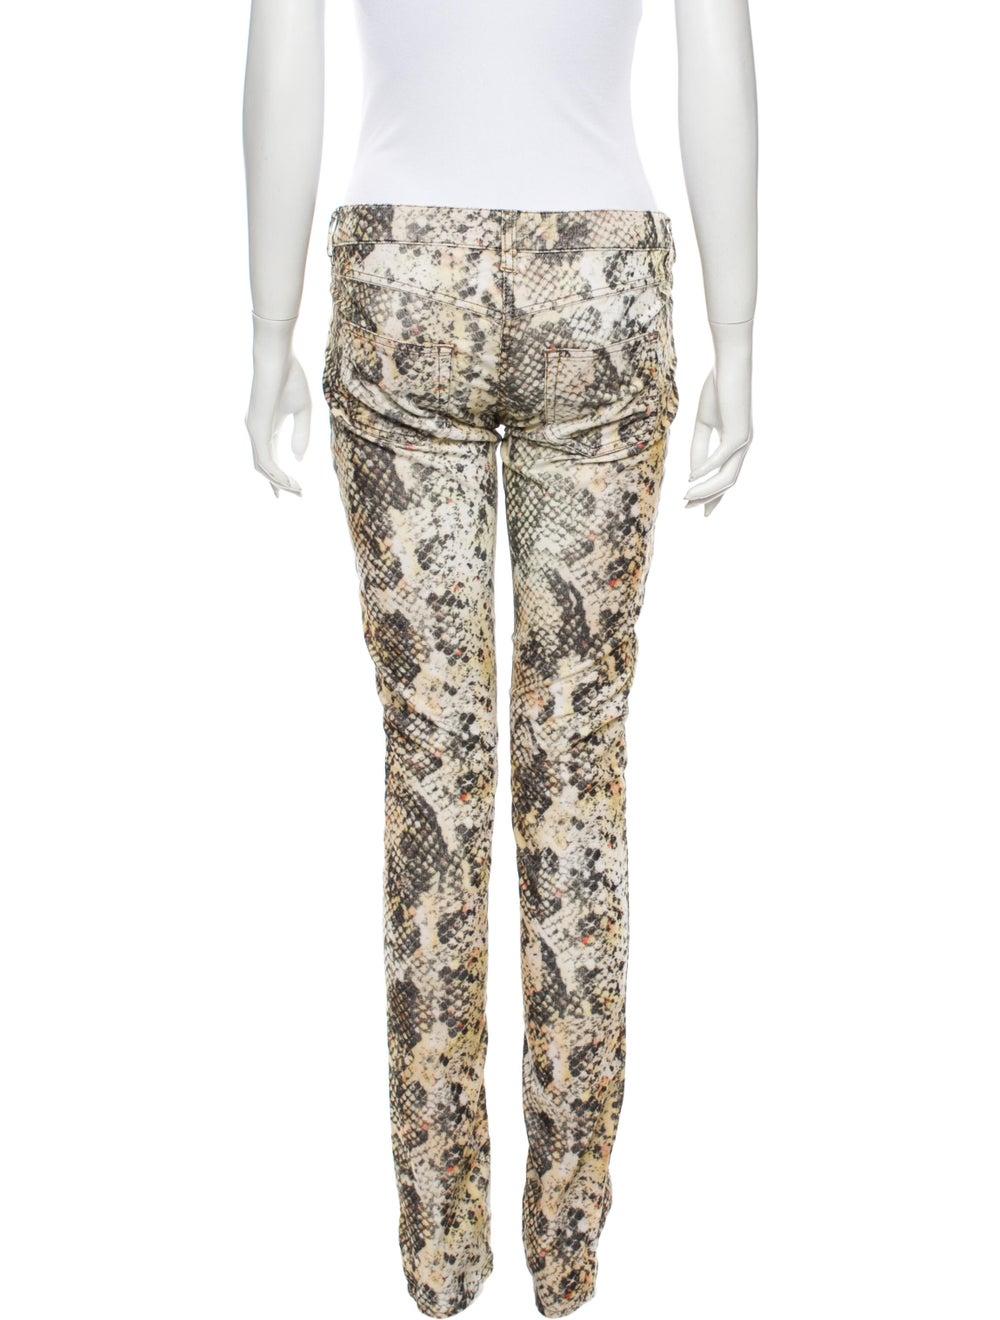 Isabel Marant Animal Print Straight Leg Pants - image 3